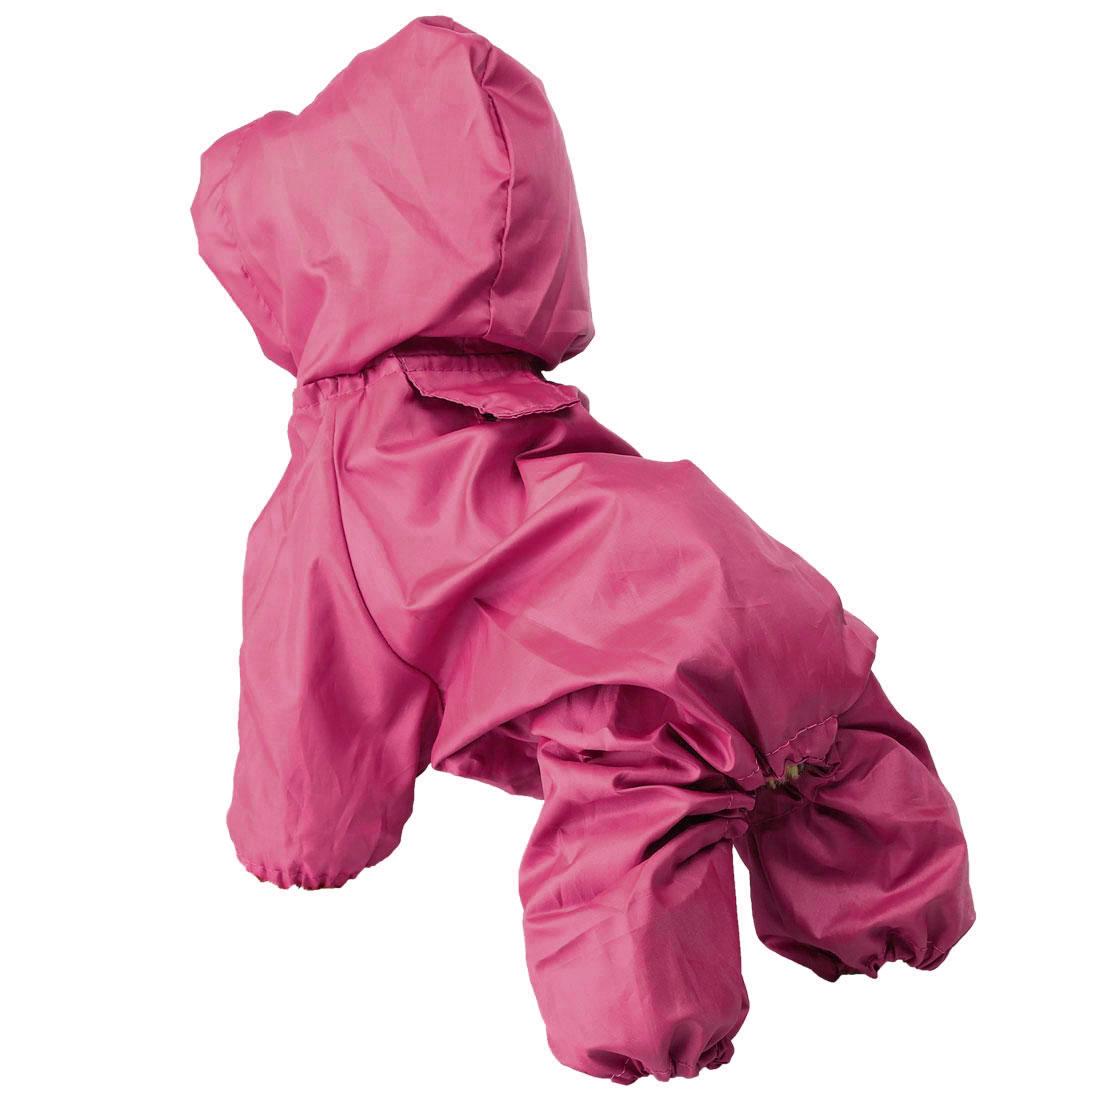 Pet Dog Raincoat Rain Jacket Polyester Water-resistant Rainwear Purple L-XL